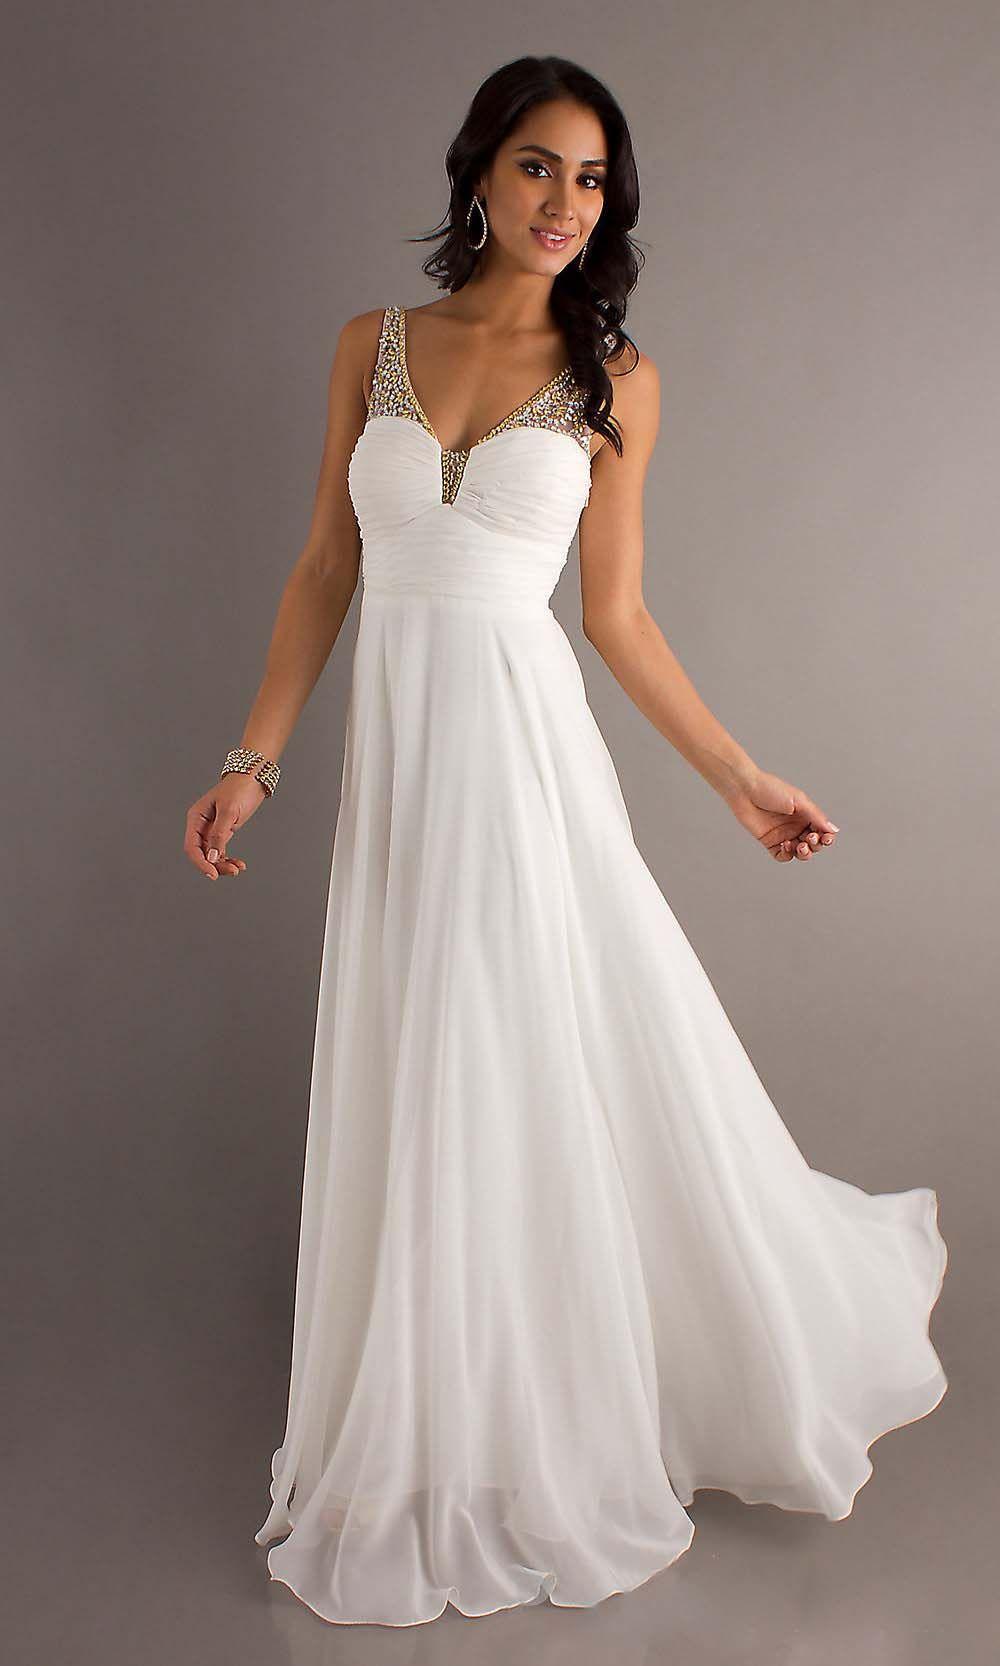 Off shoulder prom dress v neck prom dresses white prom dress